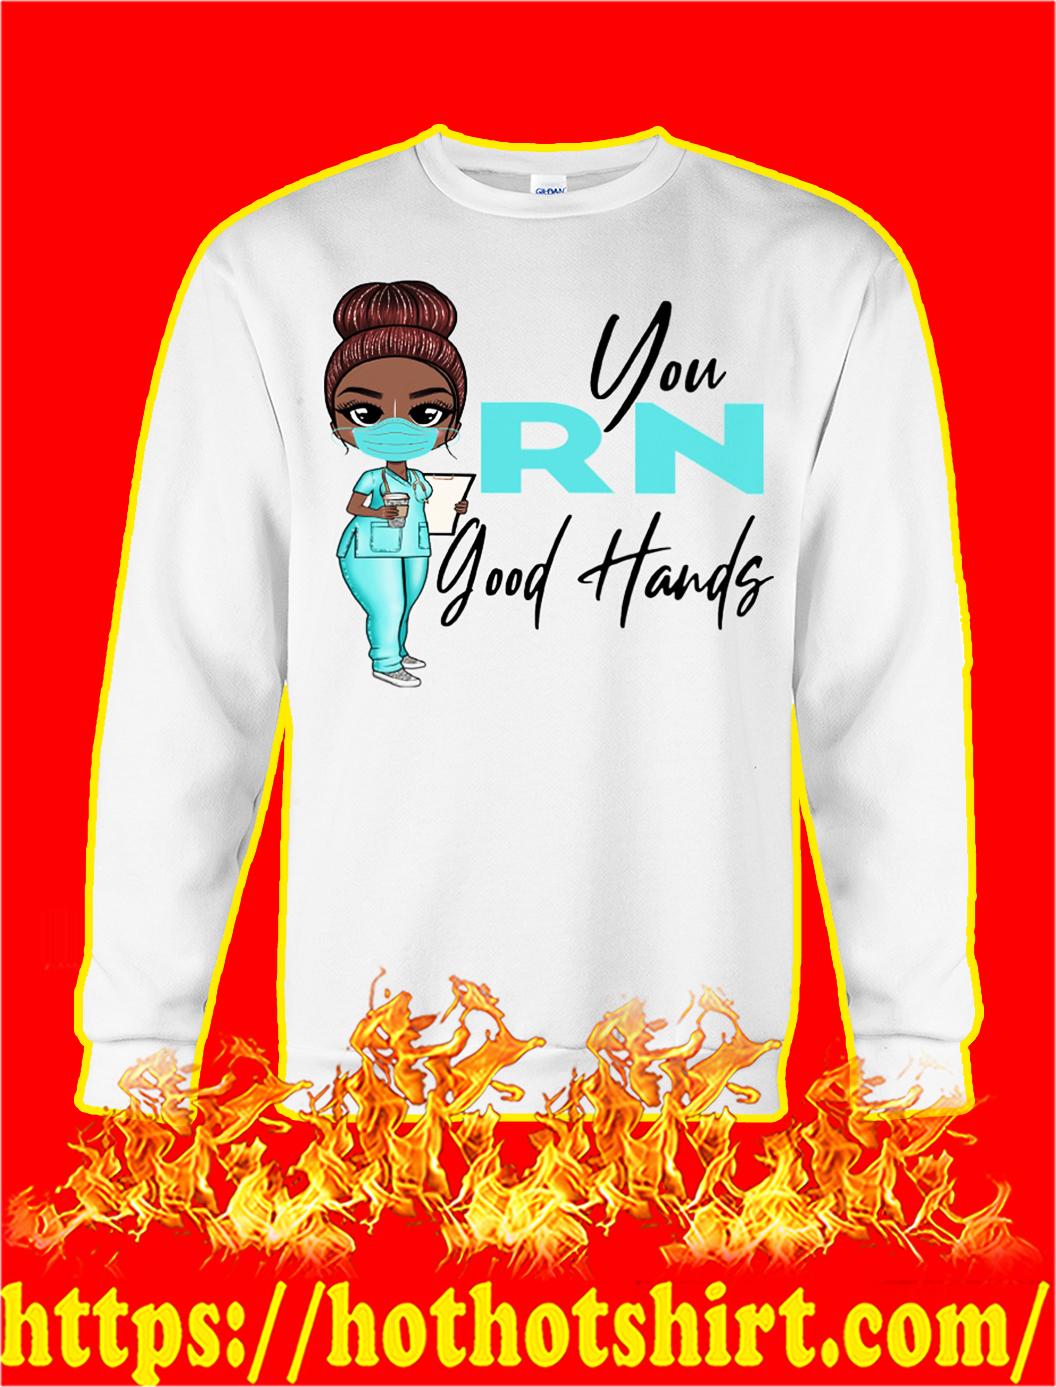 Nurse you rn good hands sweatshirt